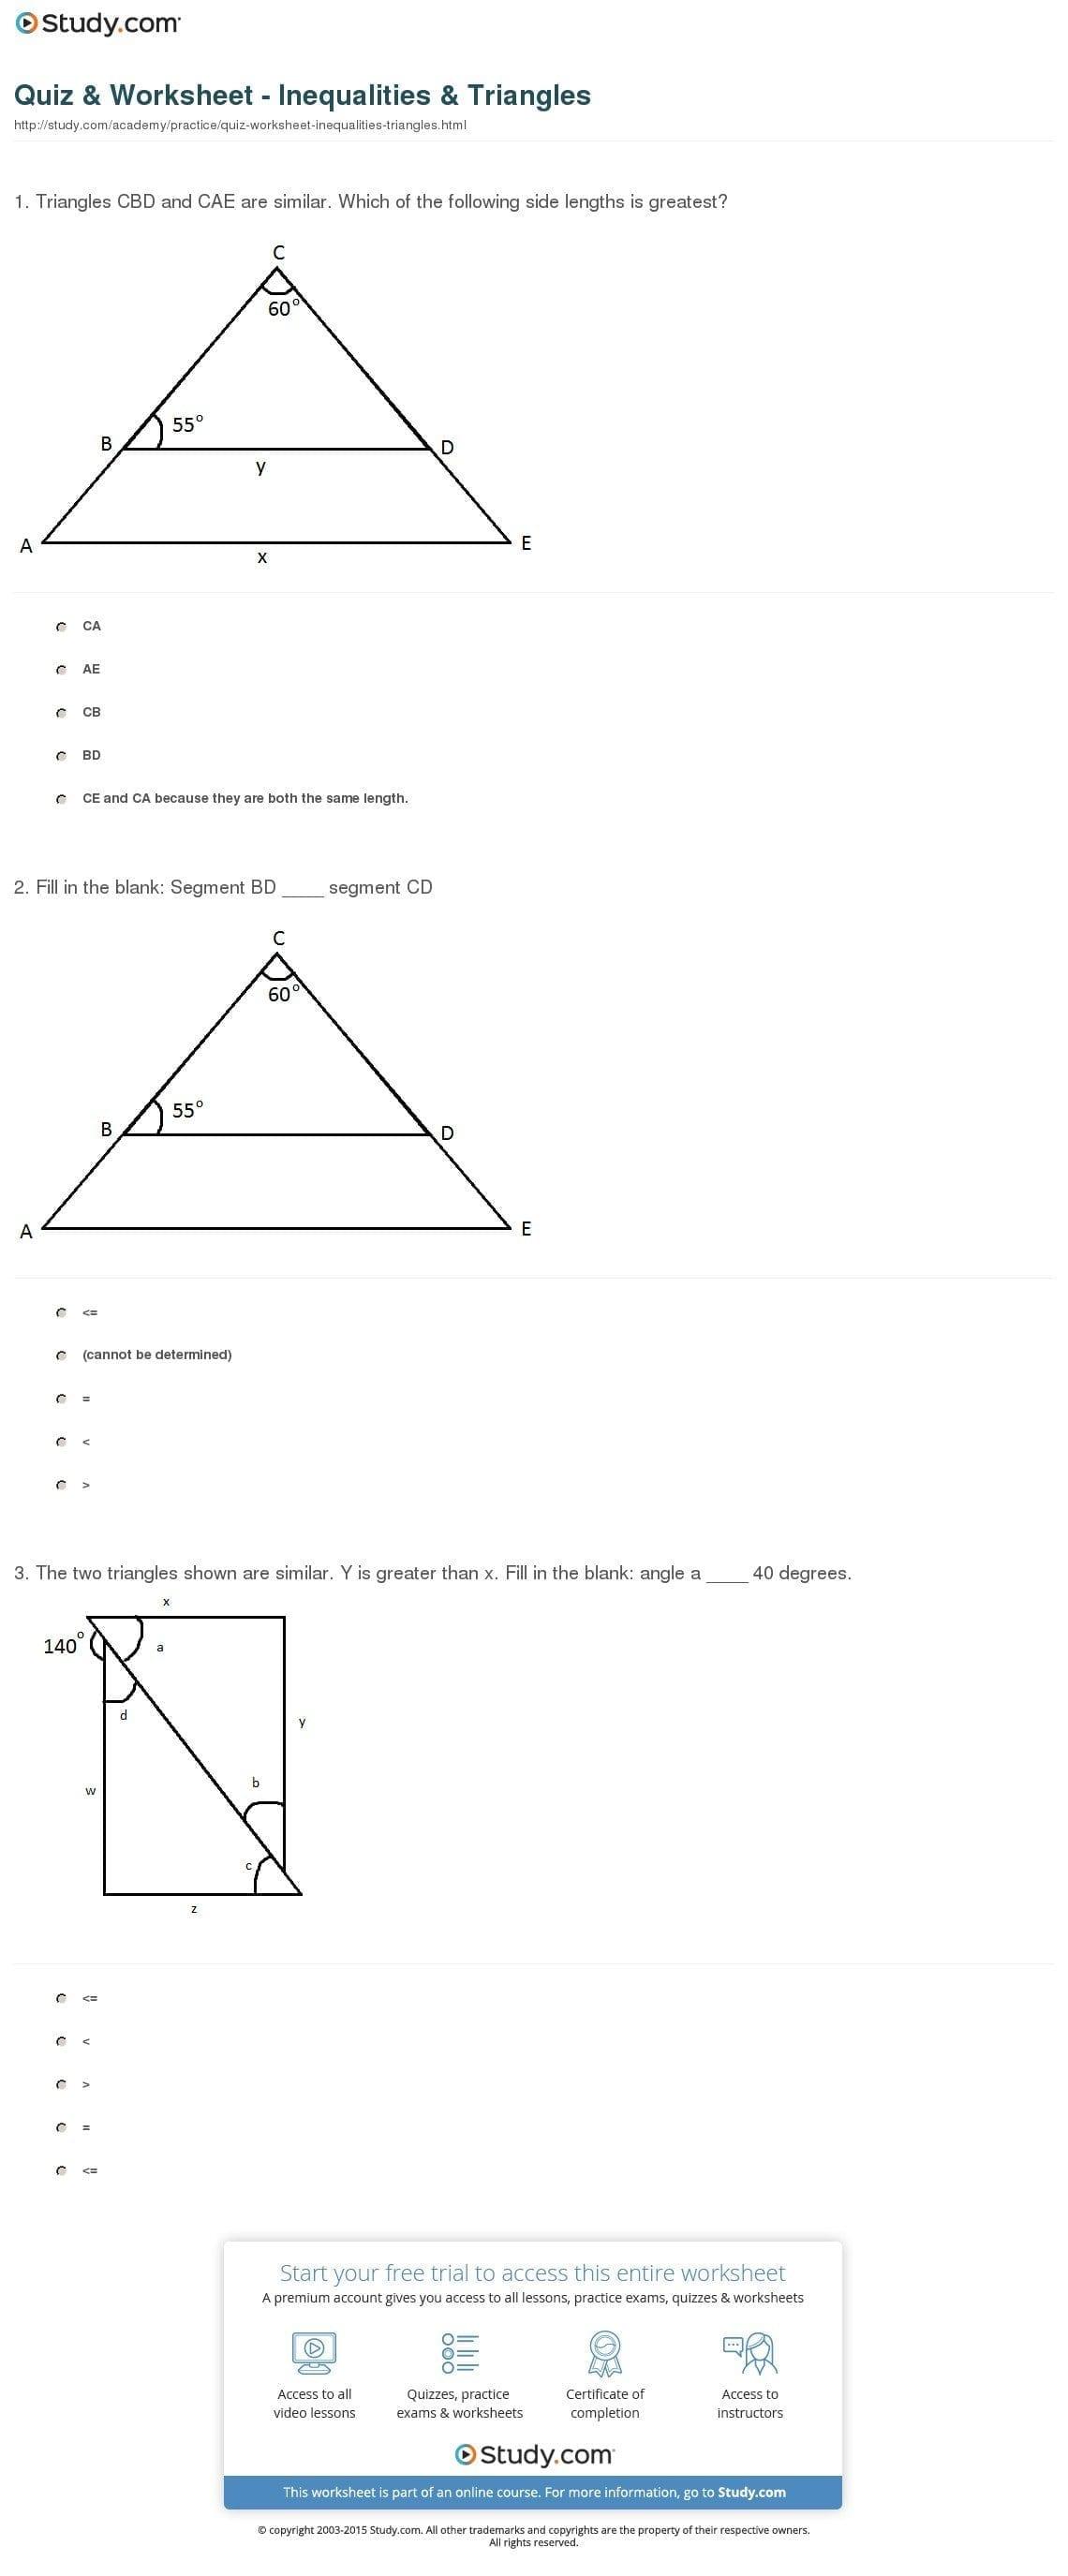 Quiz  Worksheet  Inequalities  Triangles  Study In Triangle Inequality Worksheet